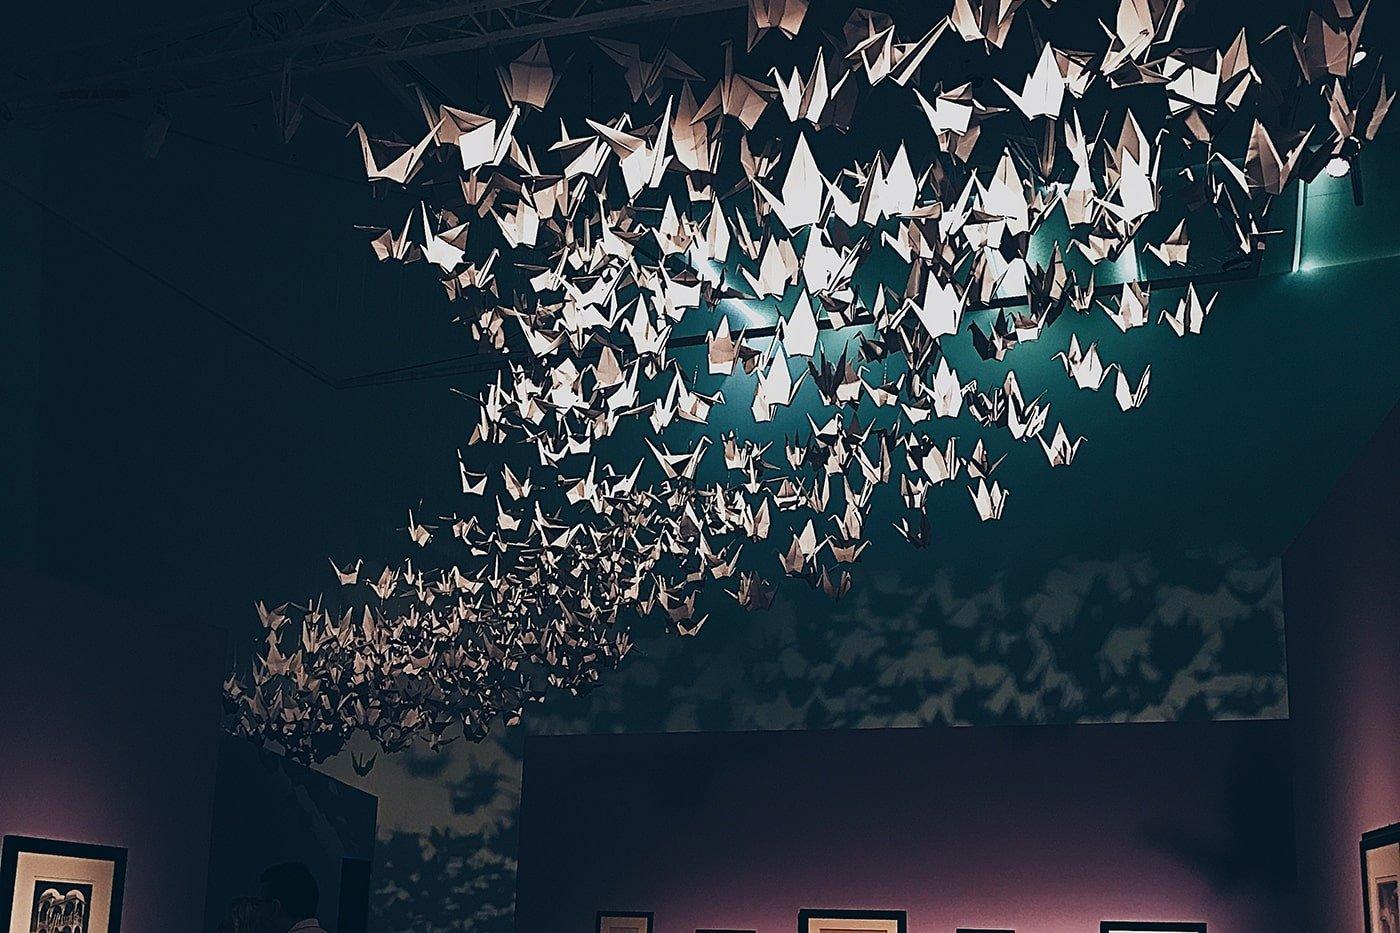 Origami cranes at art exhibition